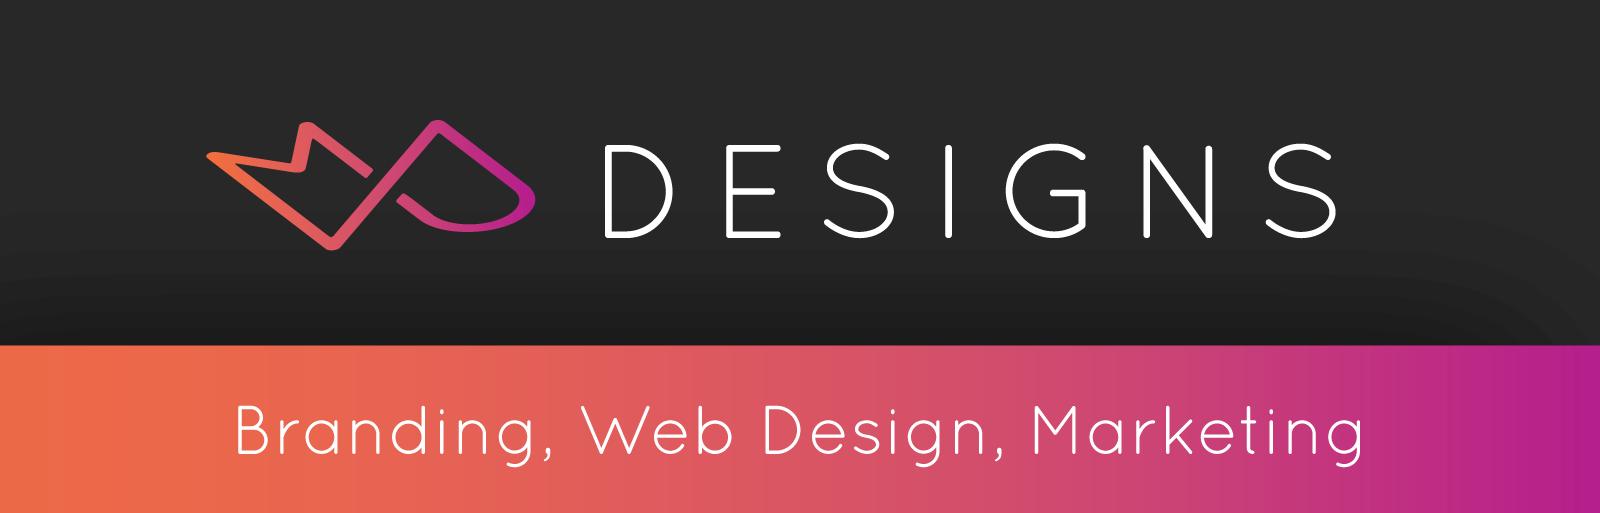 Website Design and Branding Services for Psychologists